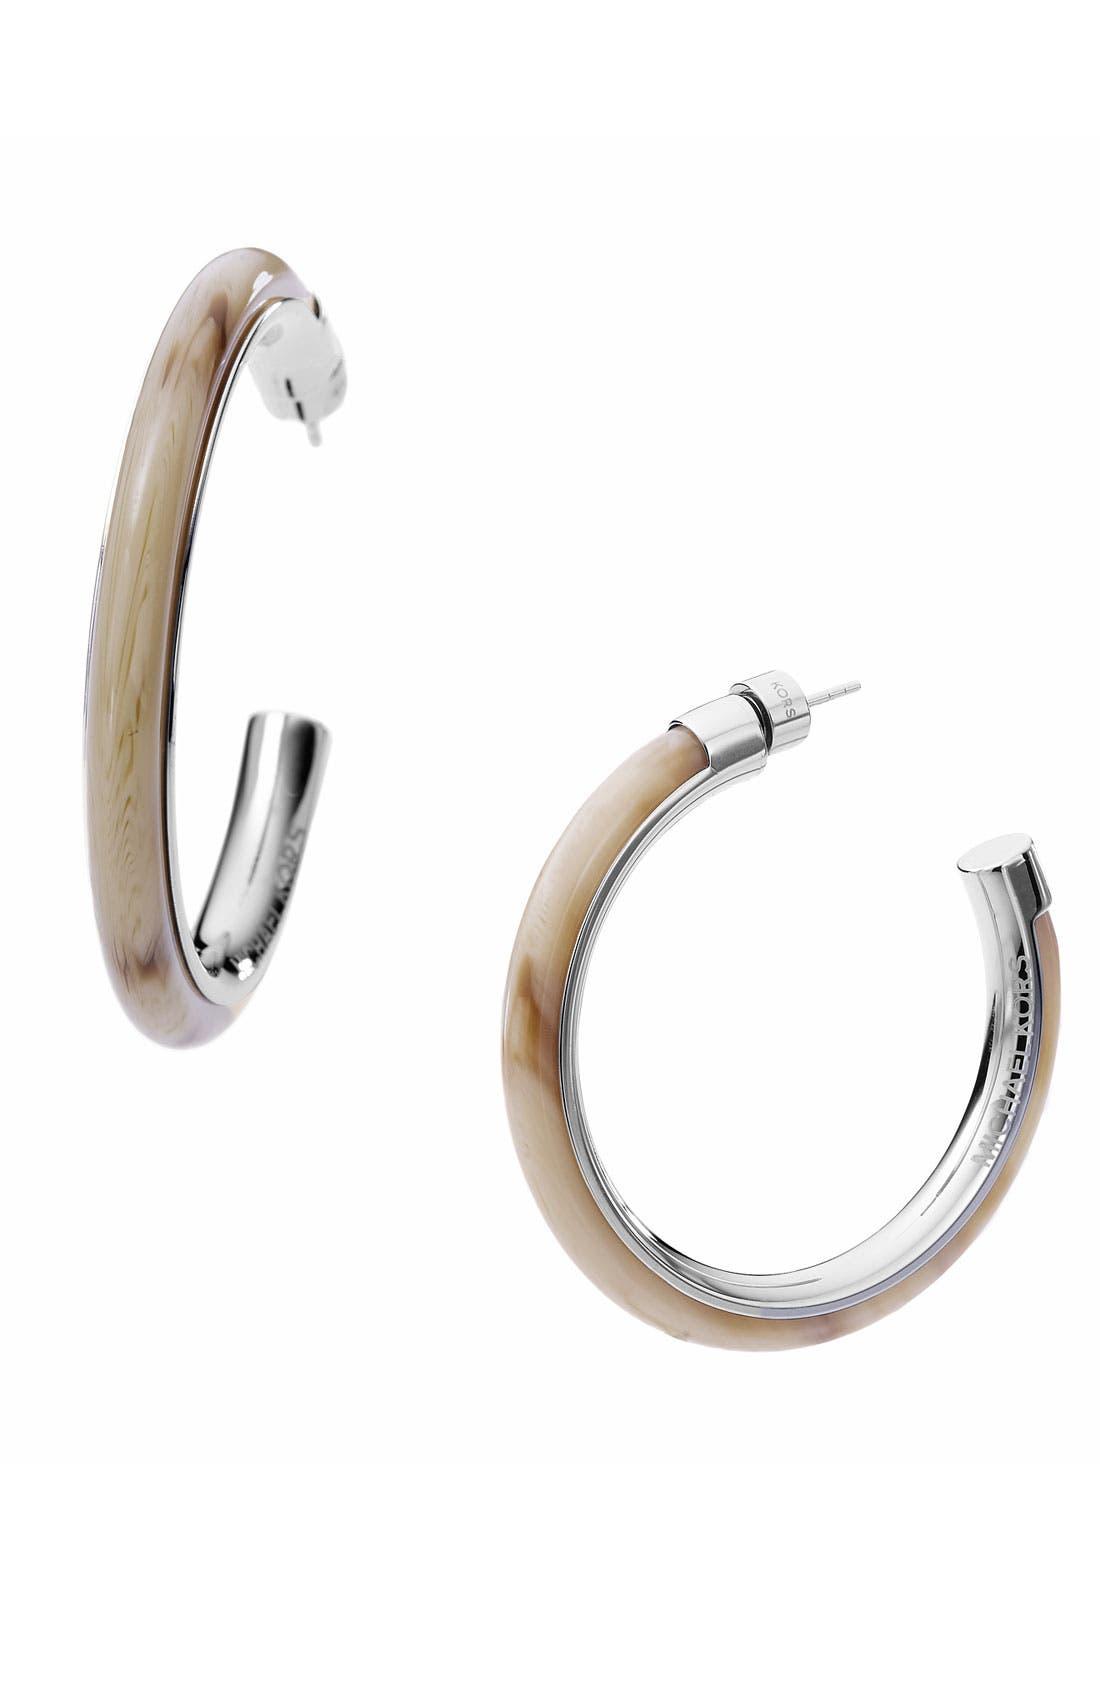 Main Image - Michael Kors 'Safari Glam' Inlay Hoop Earrings